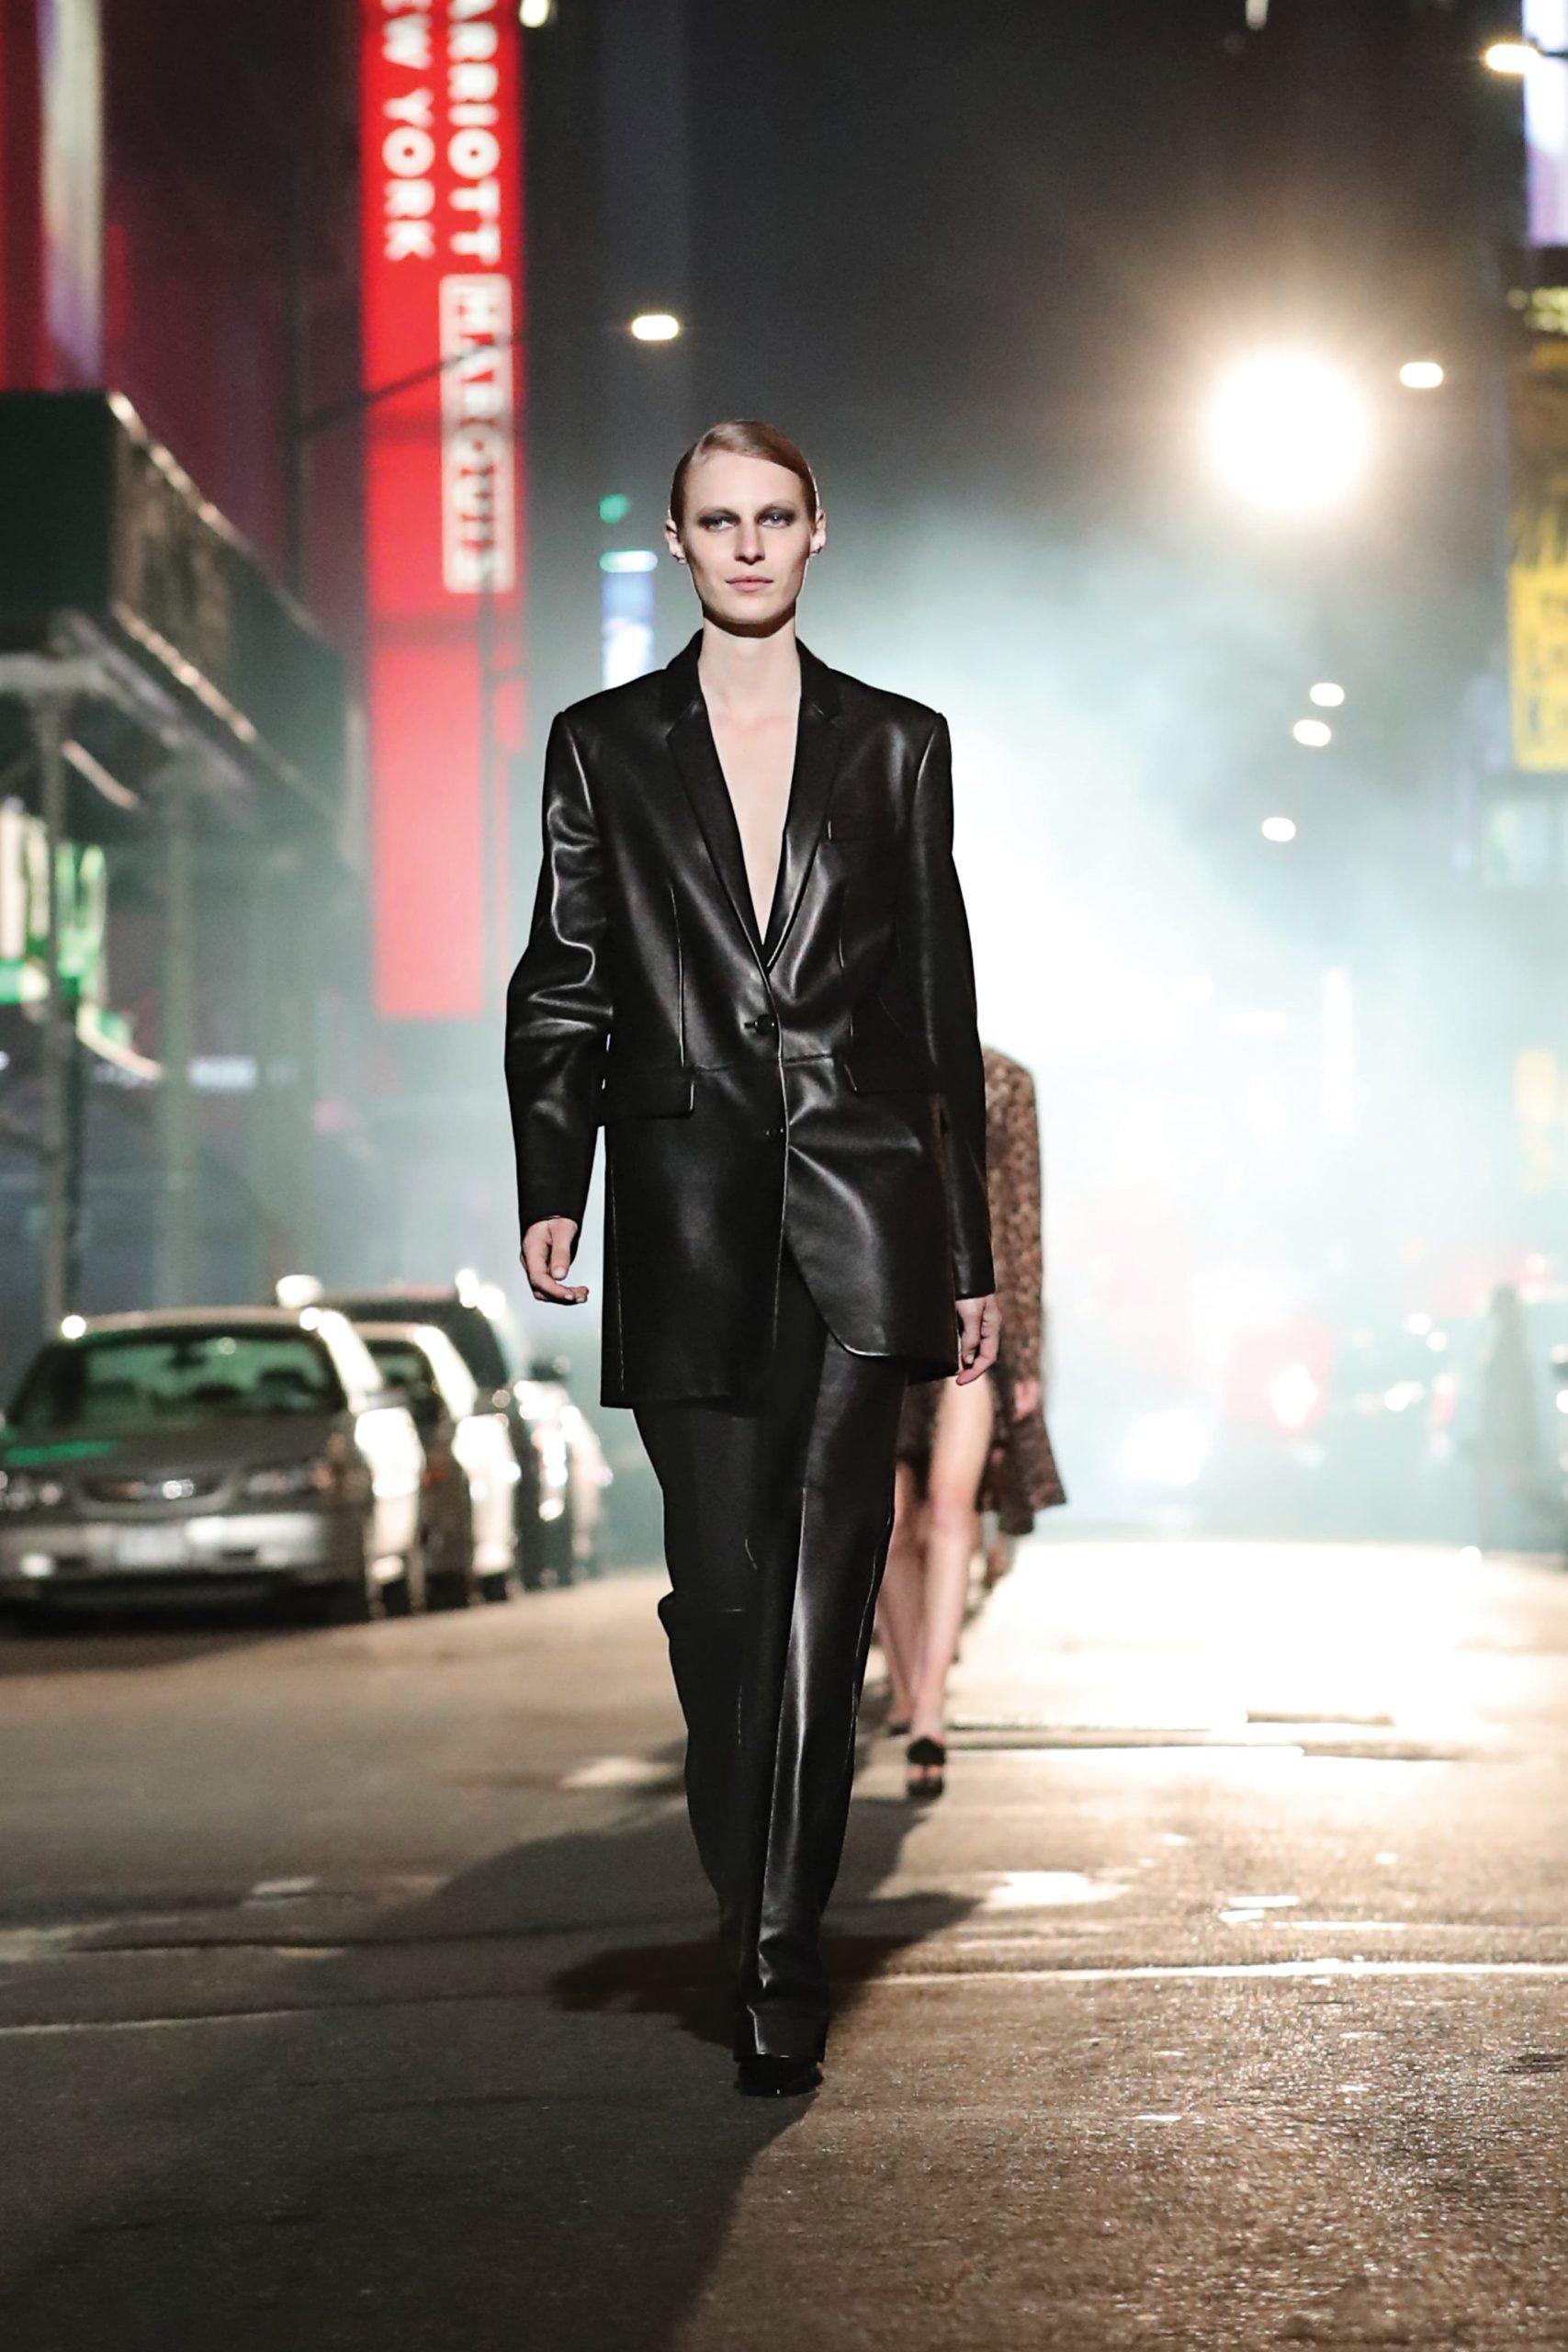 Michael Kors Fall 2021 Fashion Show Photos